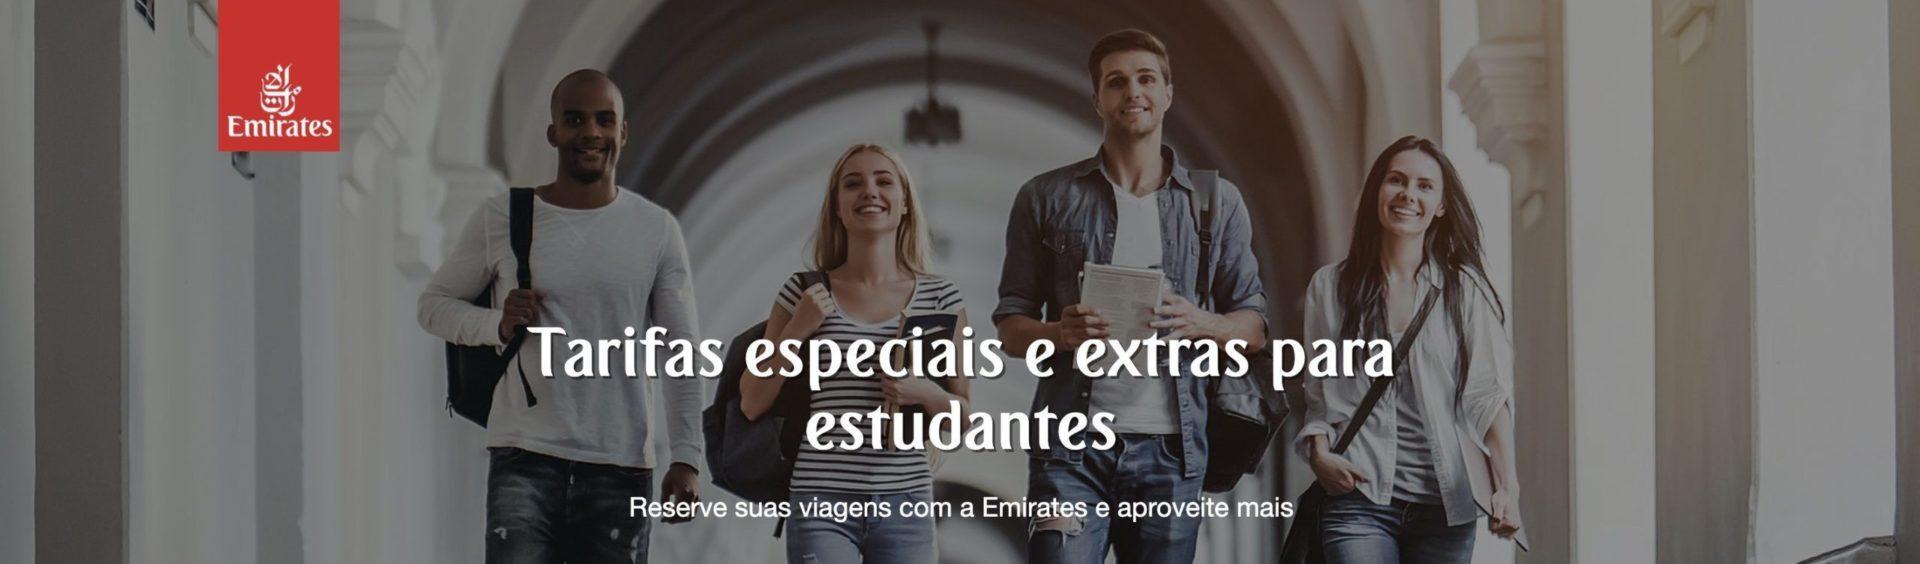 Emirates desconto estudantes